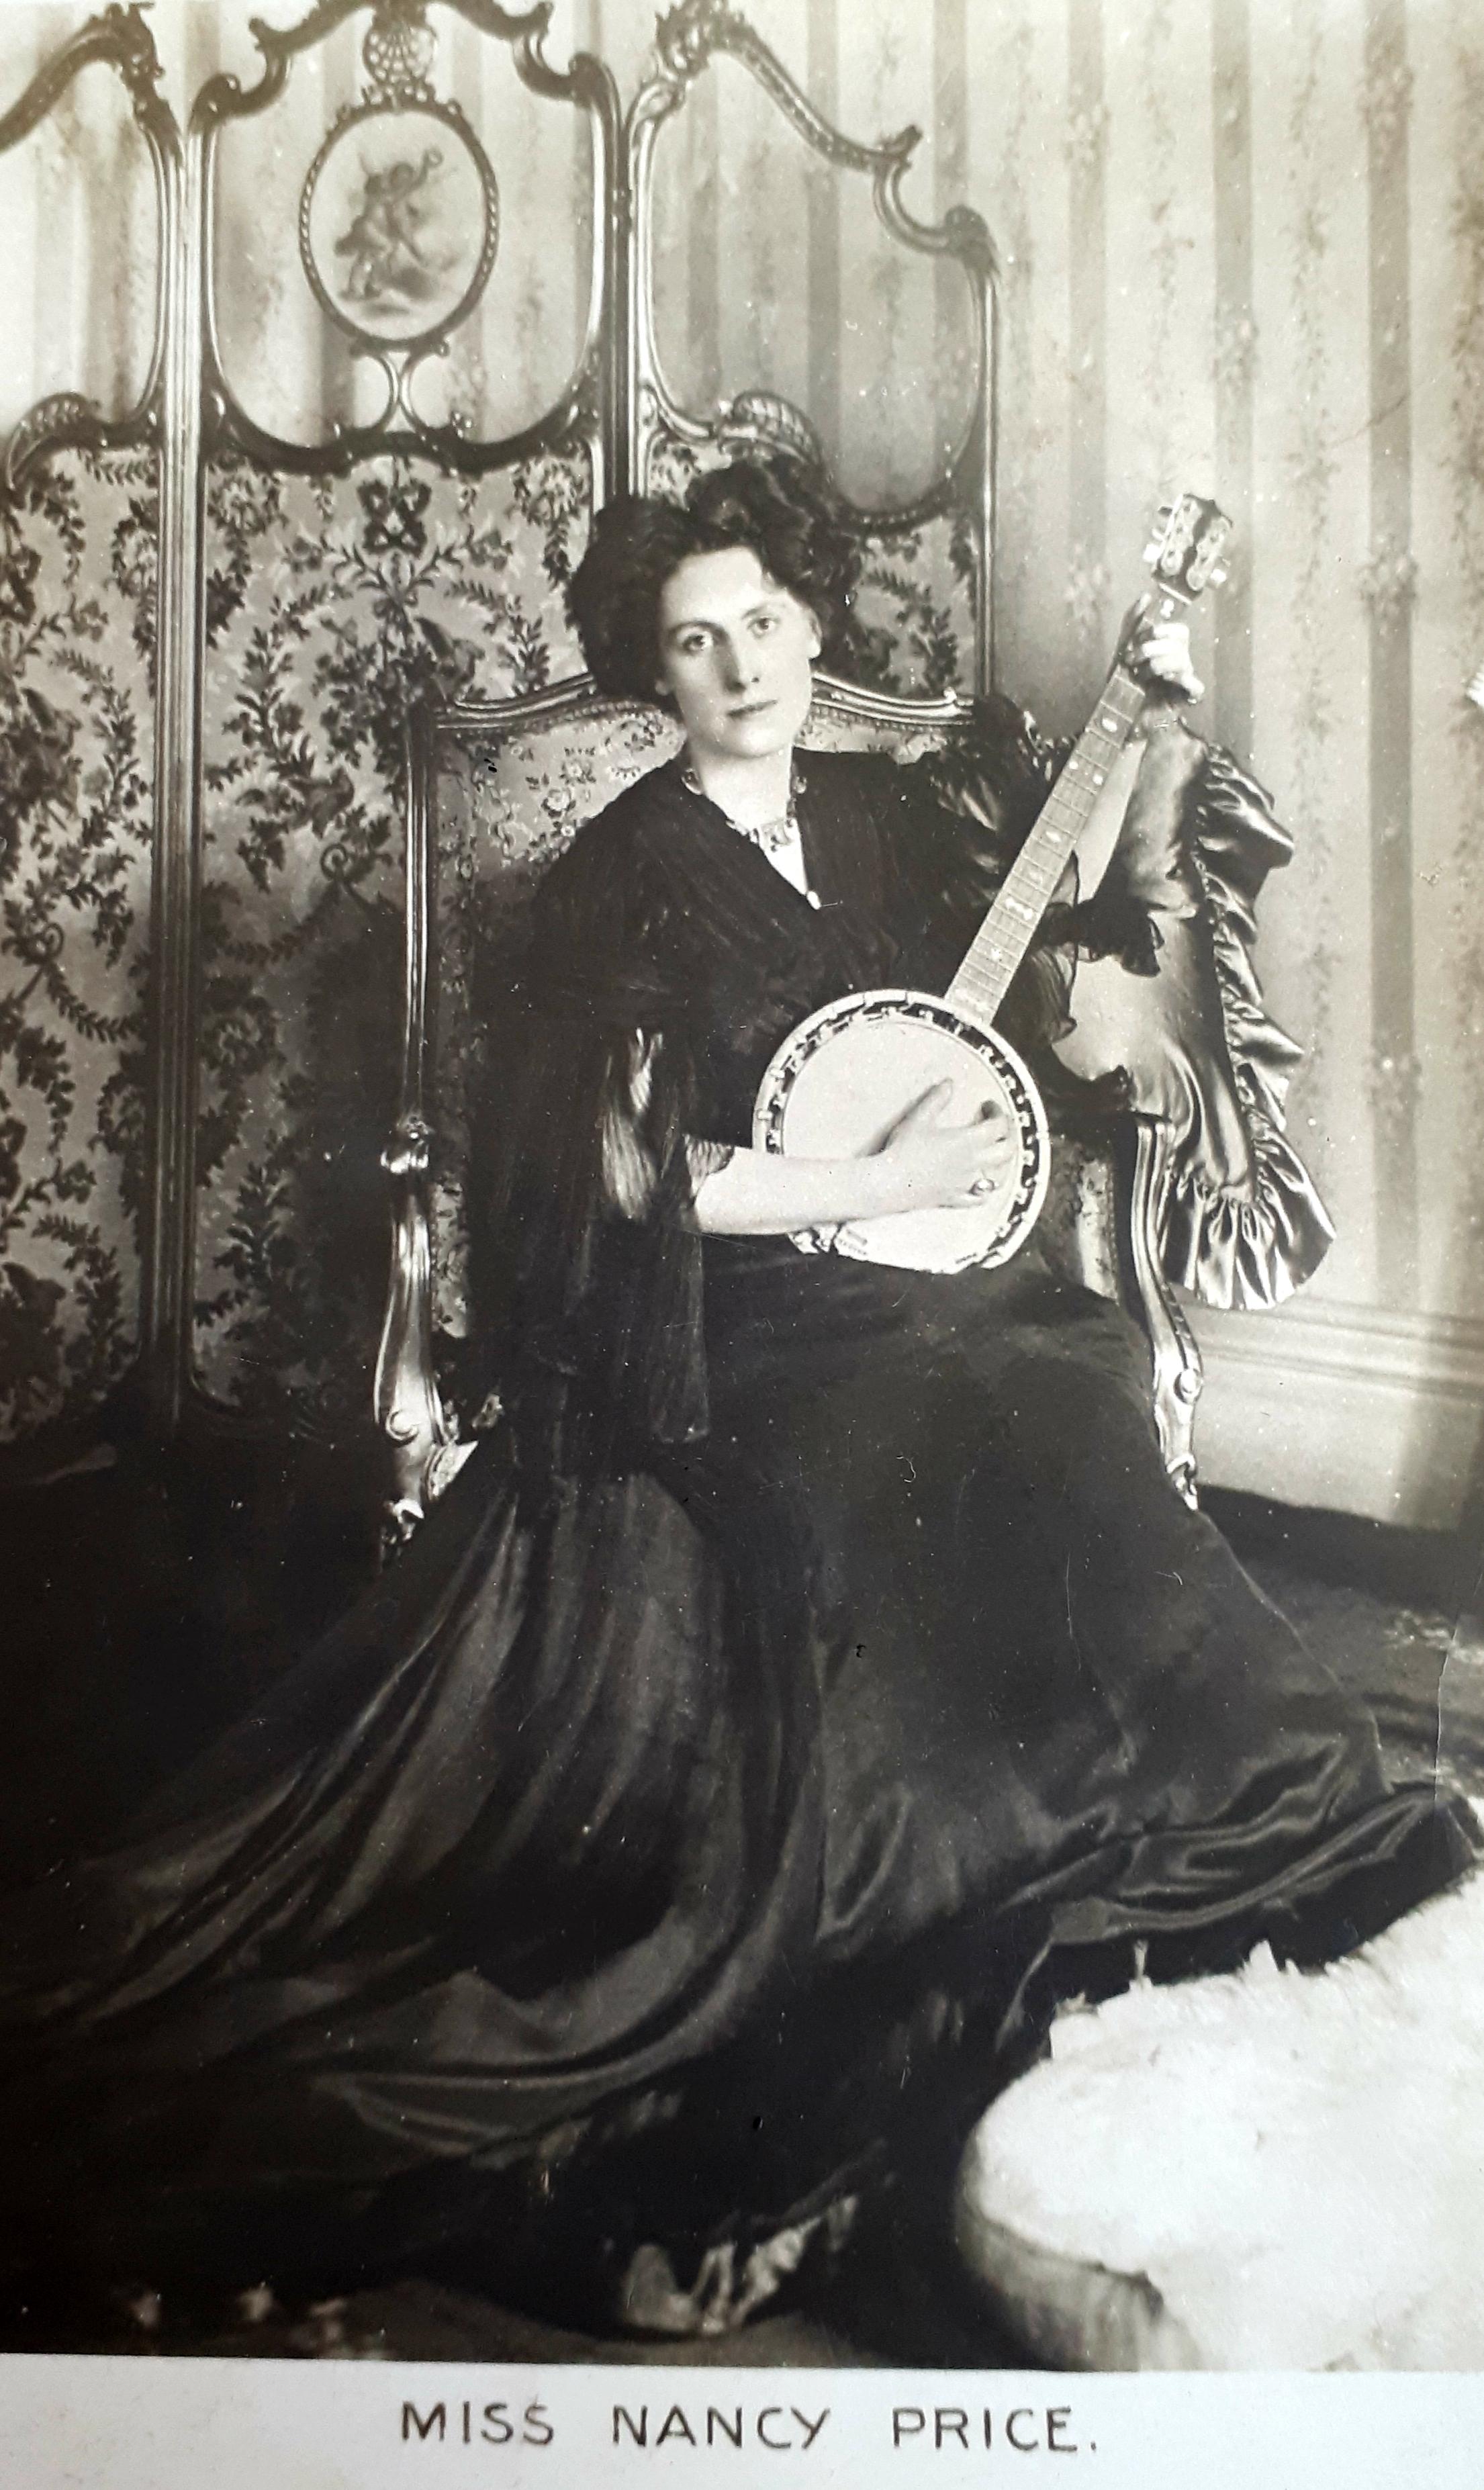 Maeve Dermody,David Tomlinson (1917?000) Adult clips Shila Khodadad,Virginia Gardner